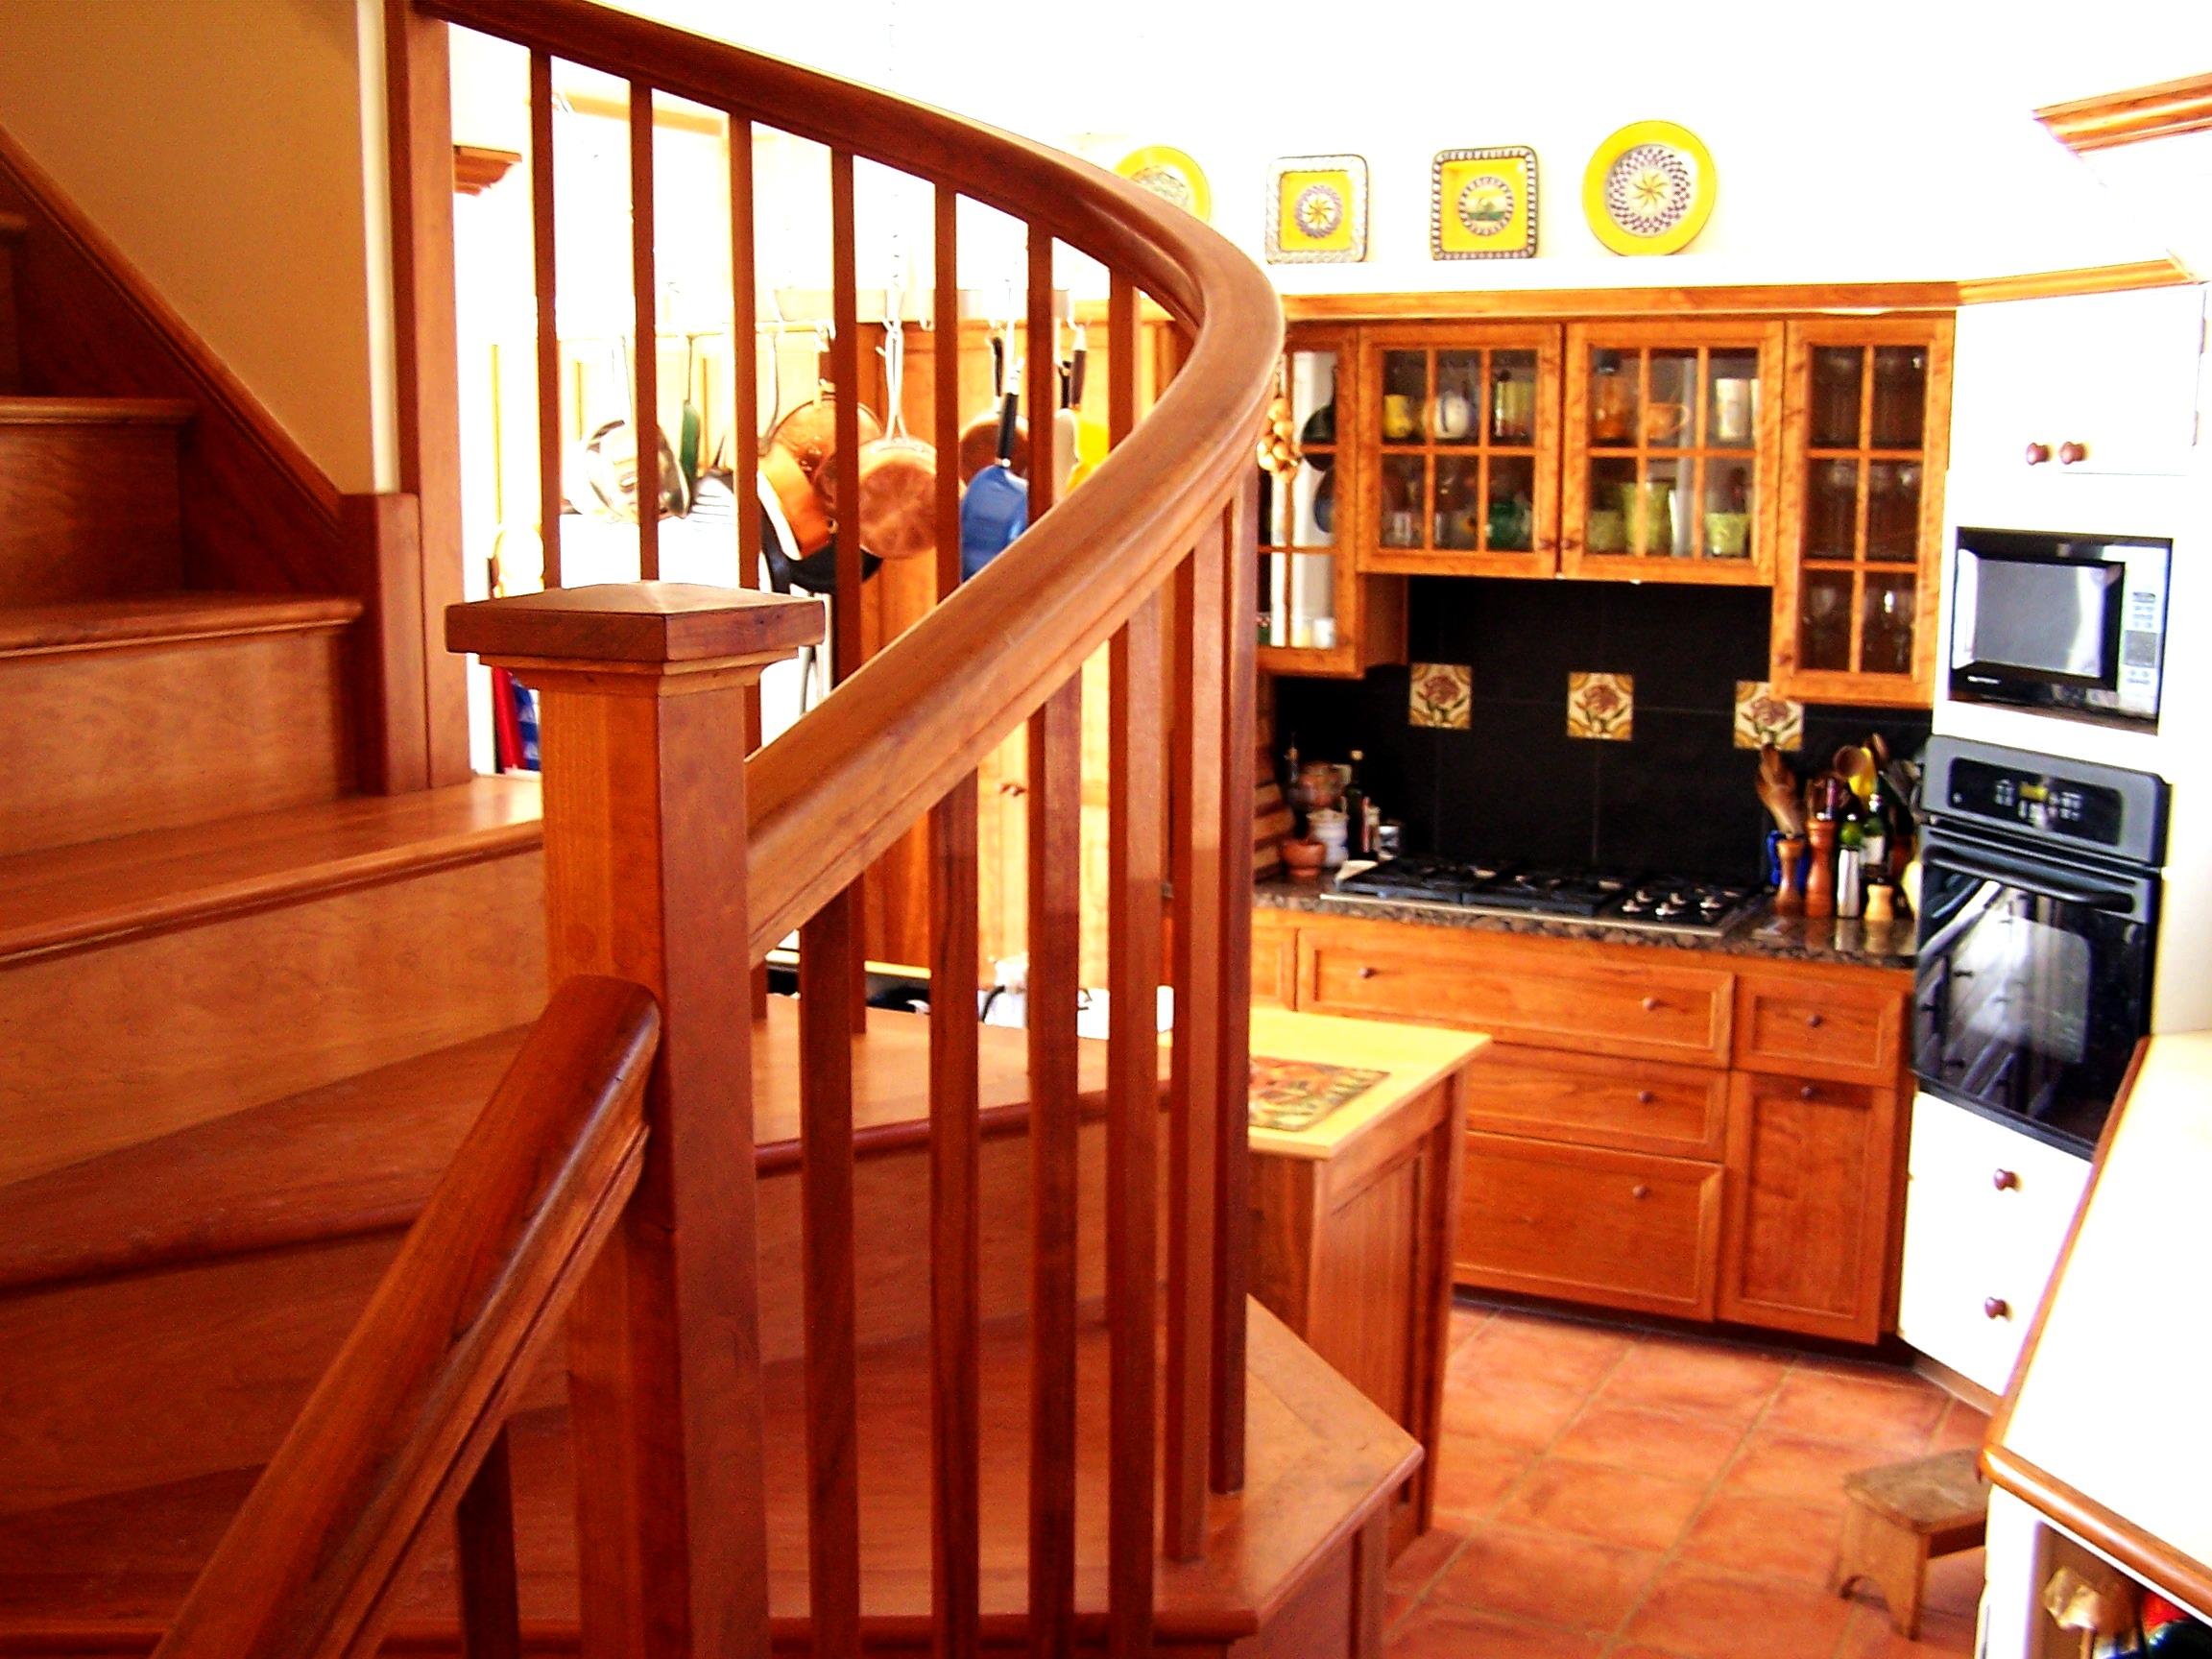 adjusted wang staircase1.JPG